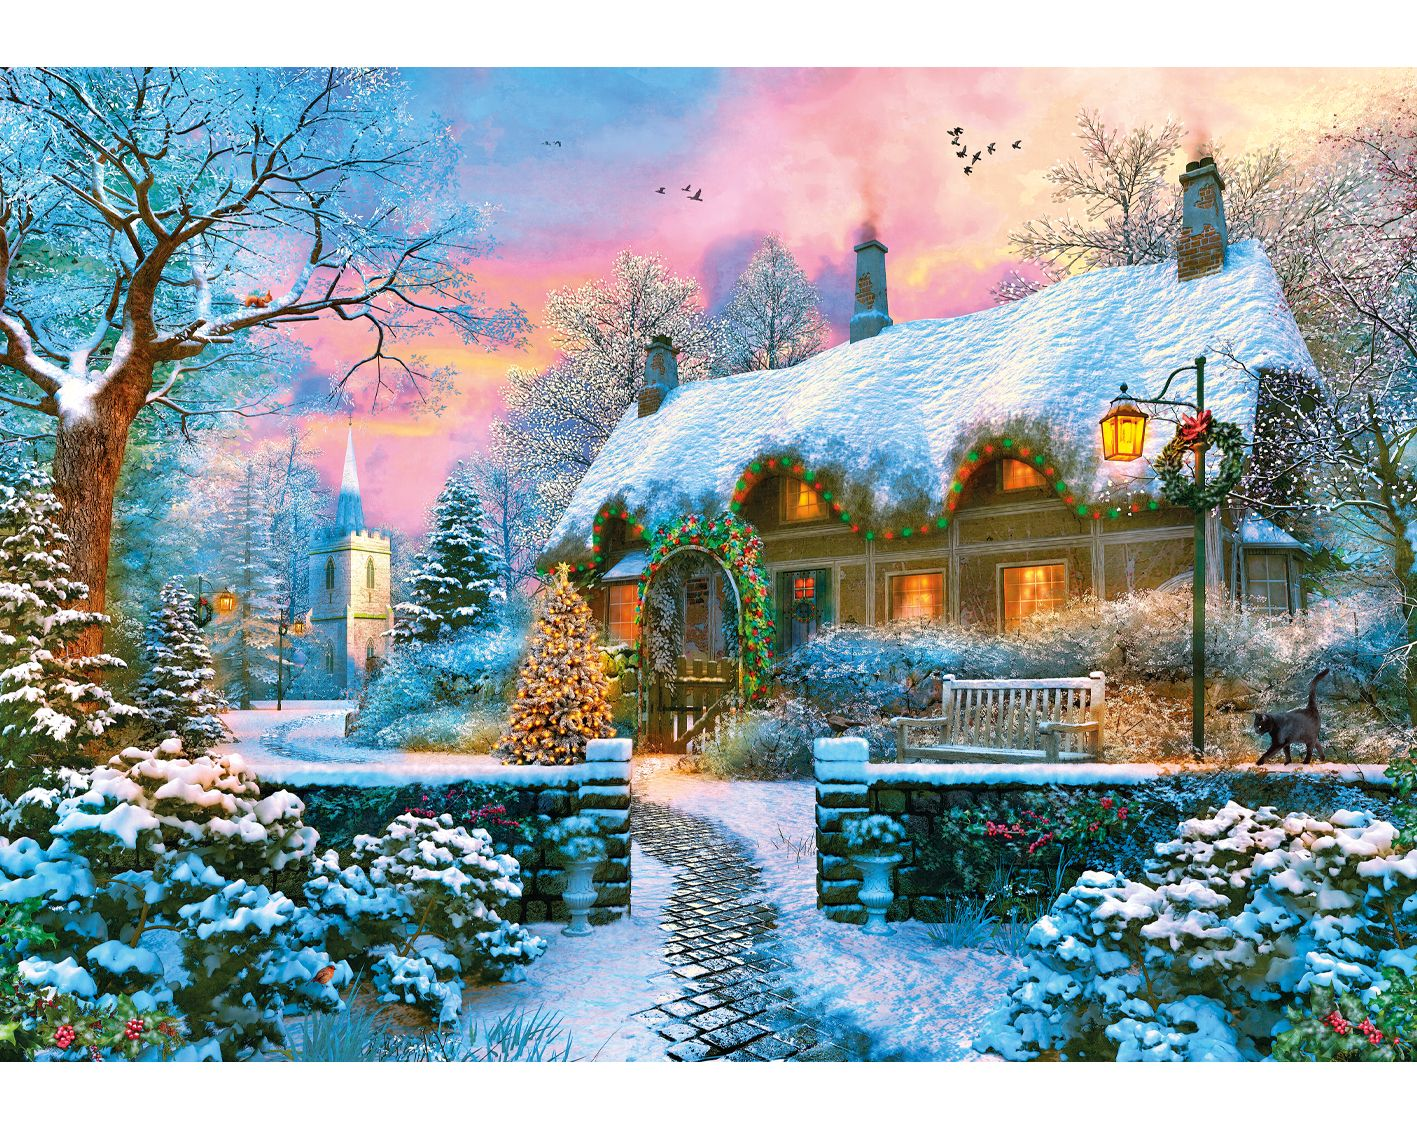 Church Lane Cottage Cottage Christmas Christmas Jigsaw Puzzles Cottage